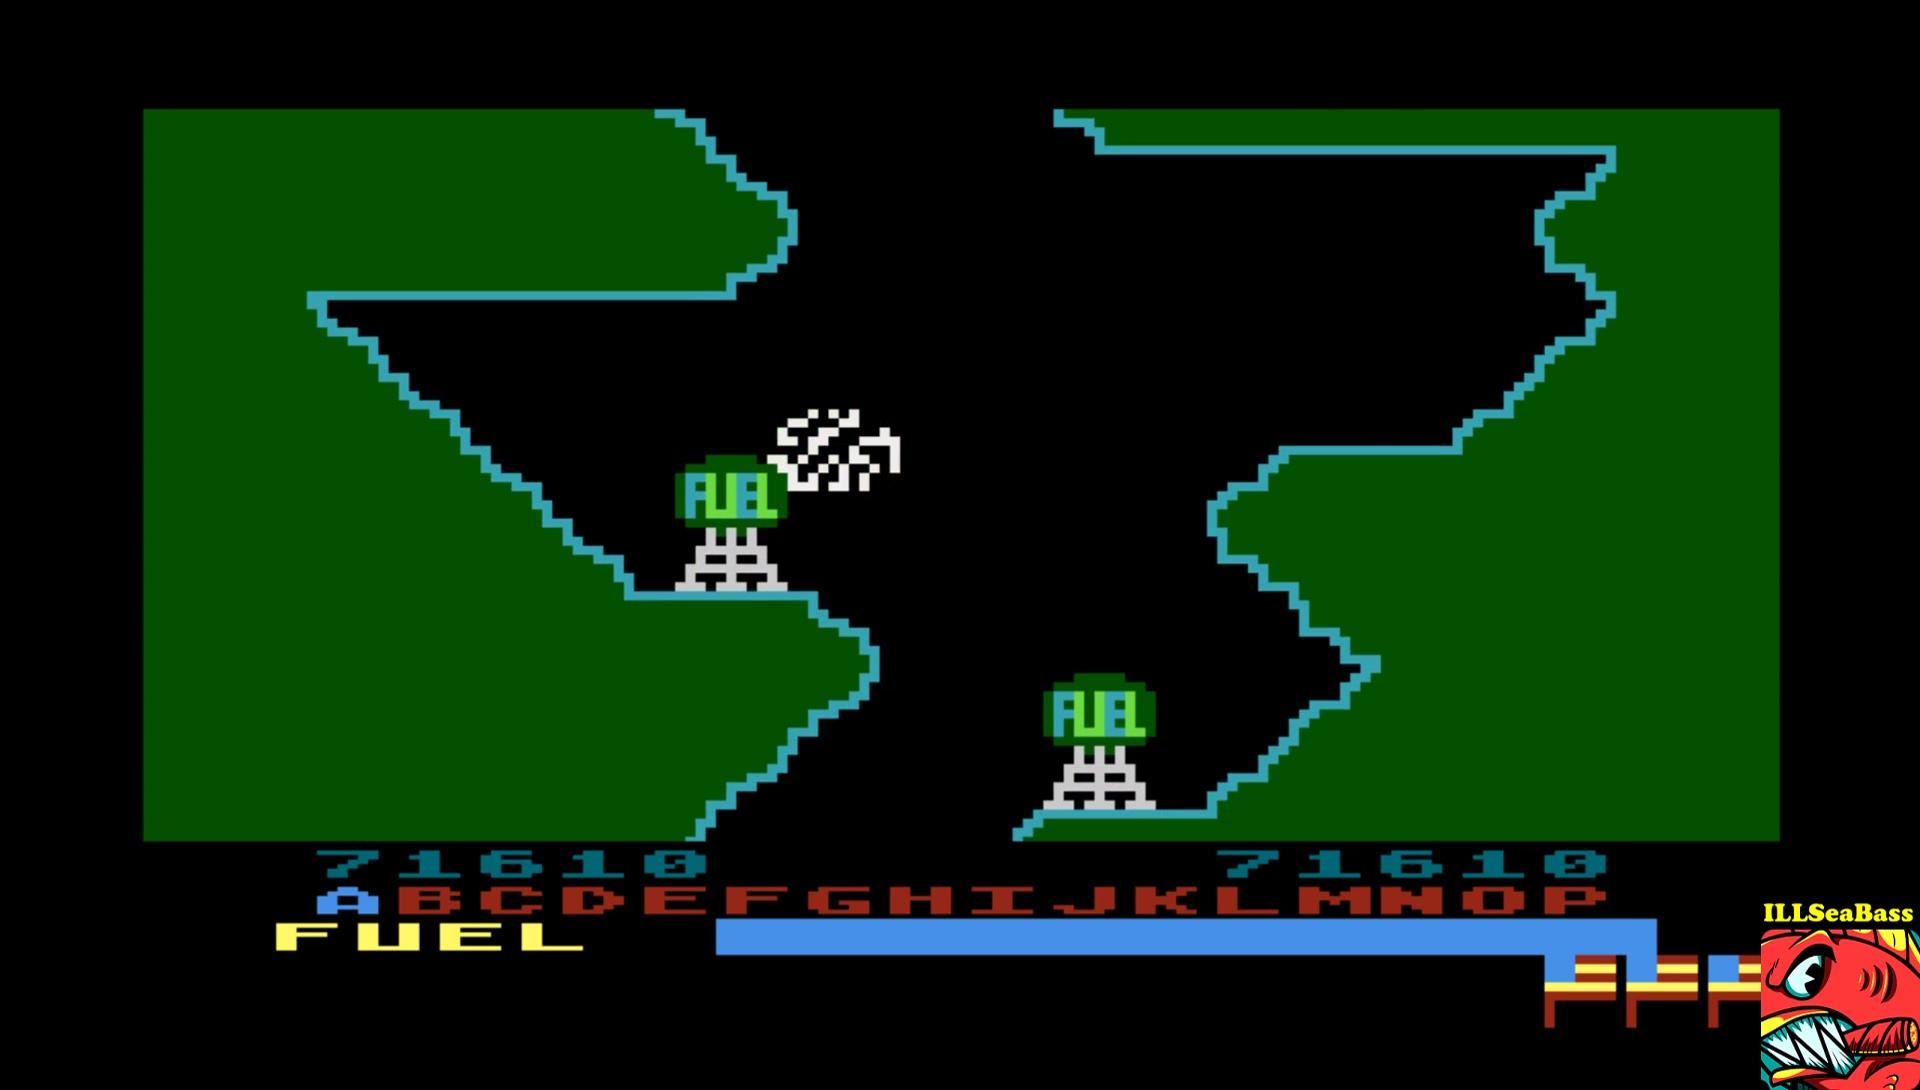 ILLSeaBass: Phobos: Pilot (Atari 400/800/XL/XE Emulated) 71,610 points on 2017-06-11 21:35:46